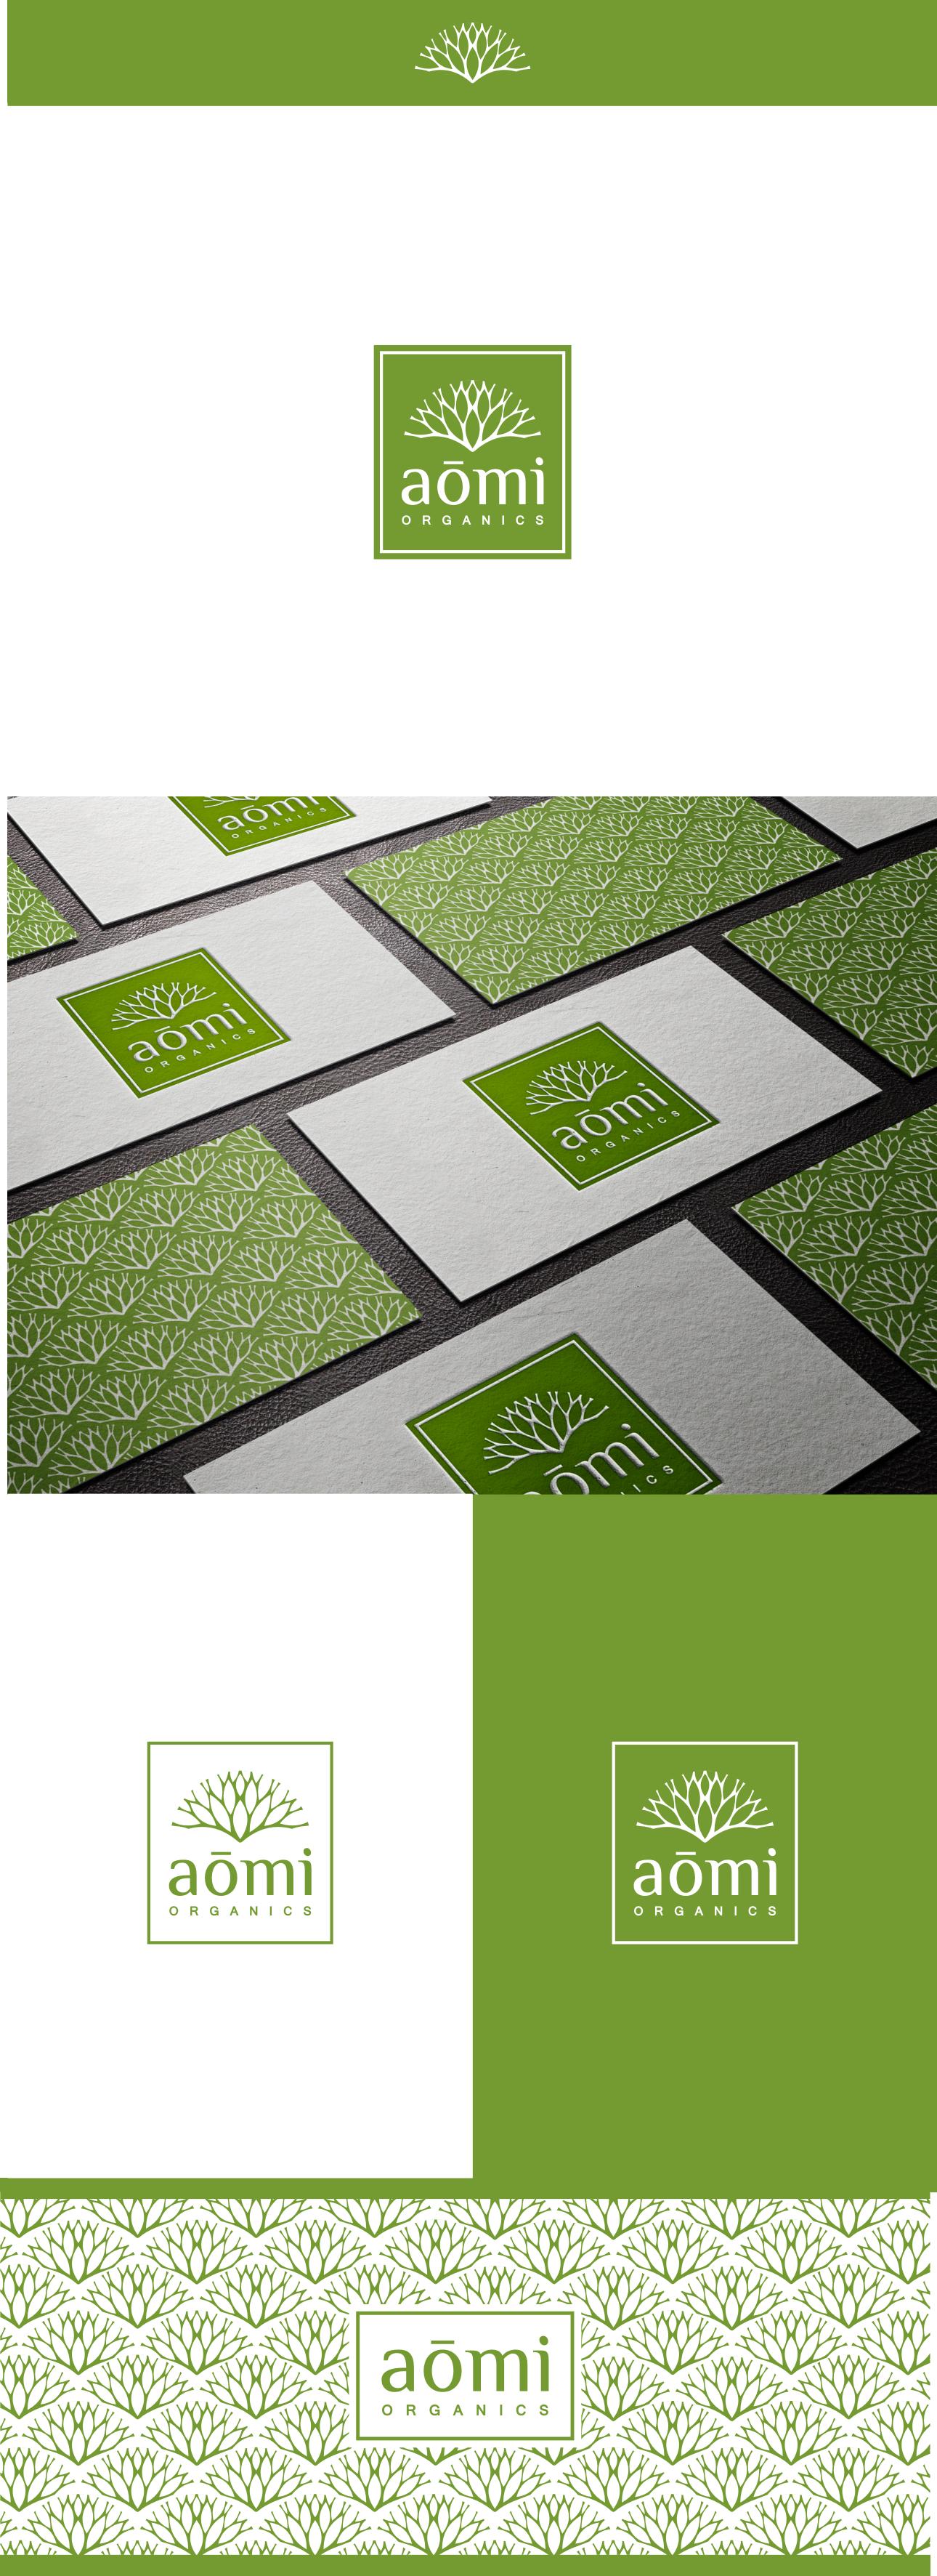 Create a hip, minimalist logo for organic skincare company